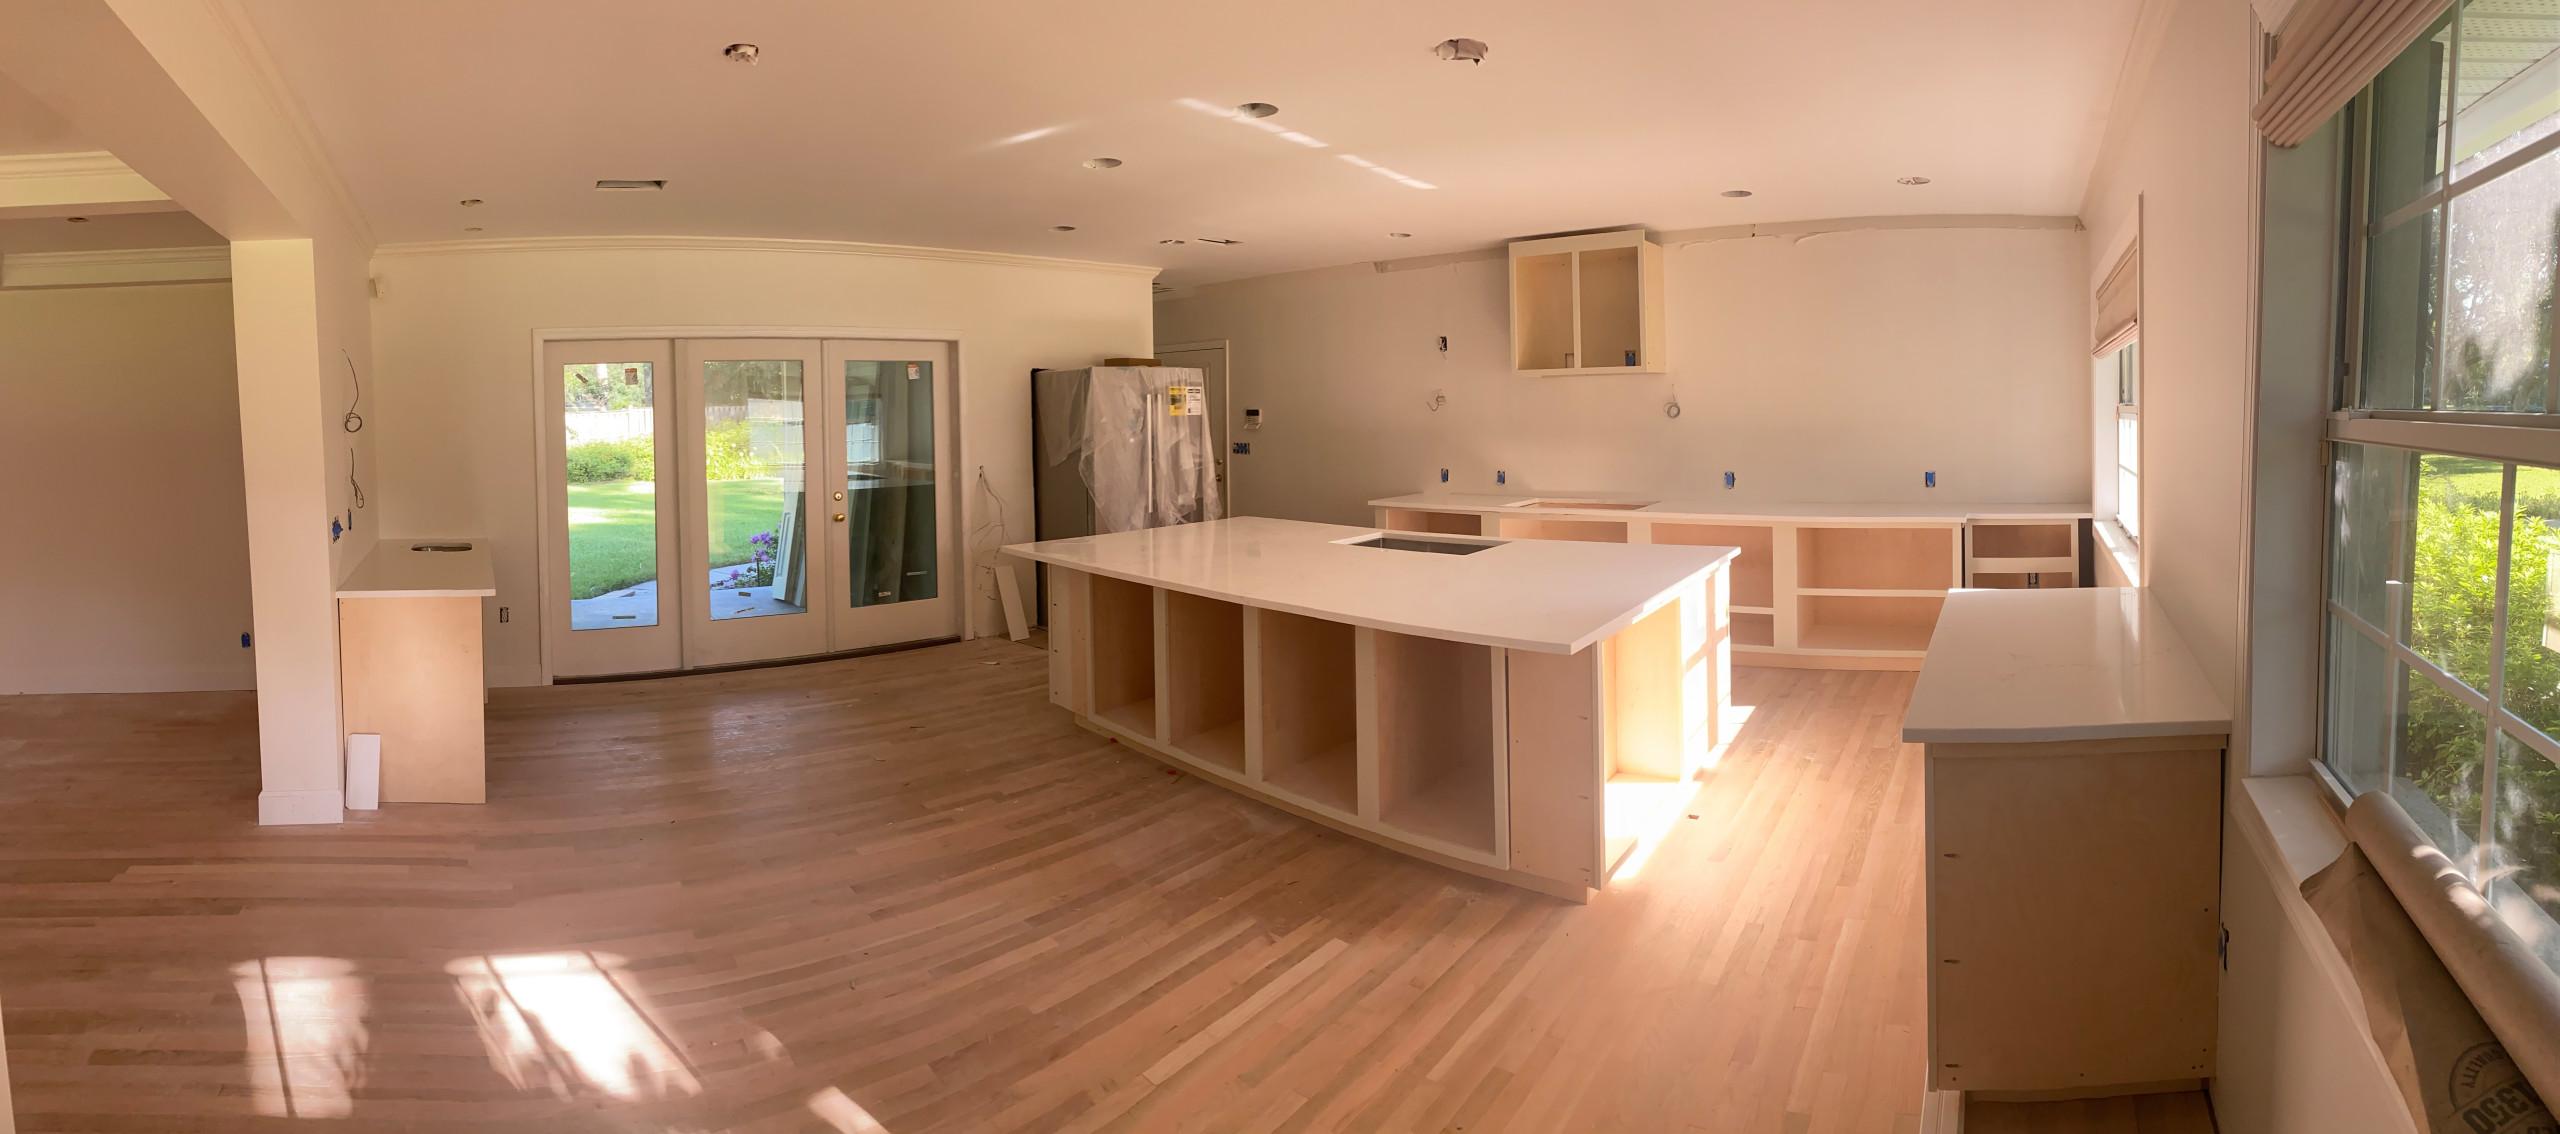 Exline Interior Remodel (In Progress)